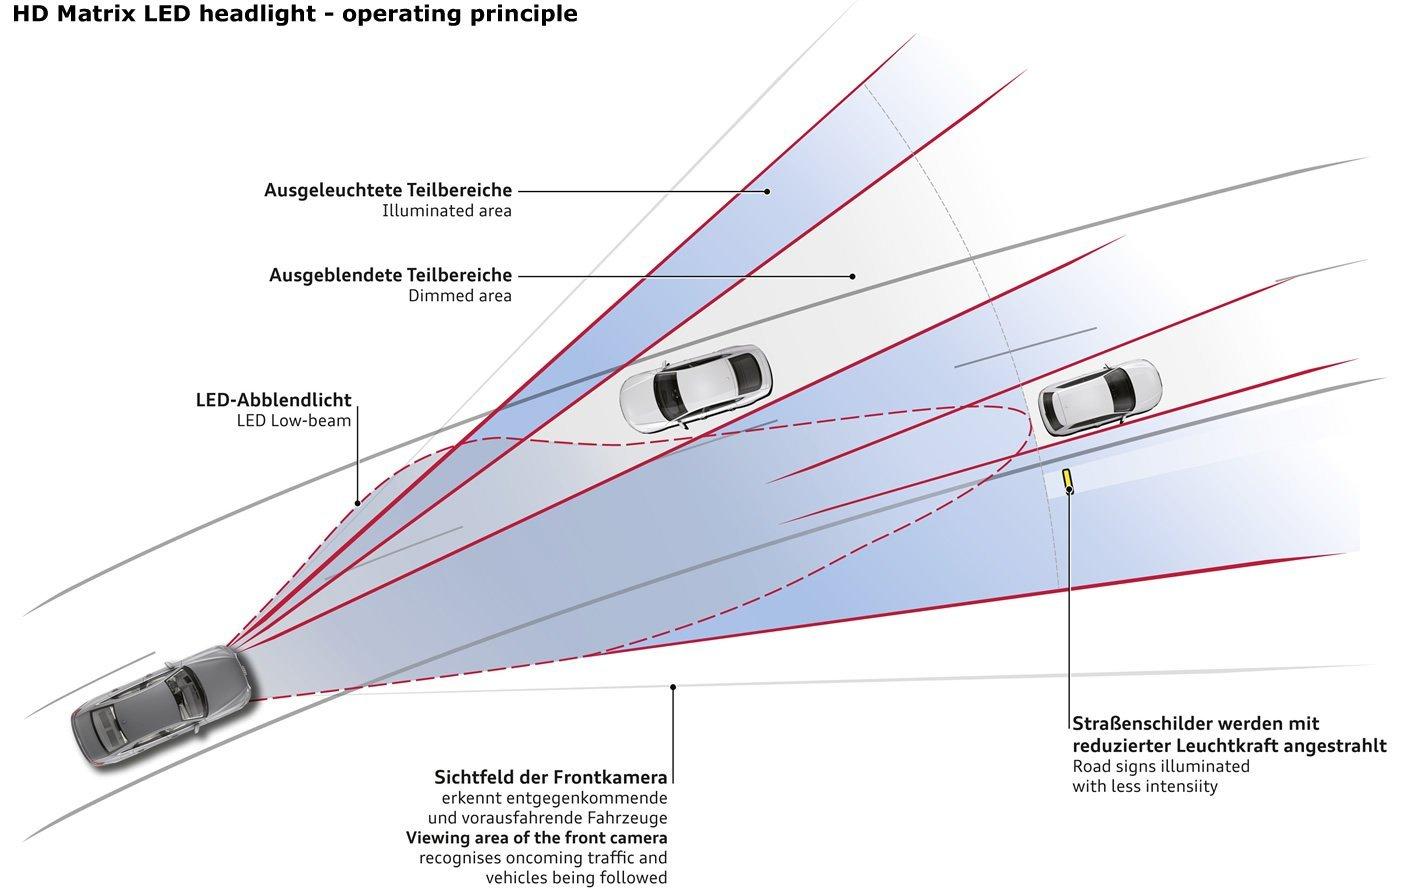 Audi HD Matrix LED - sposób działania